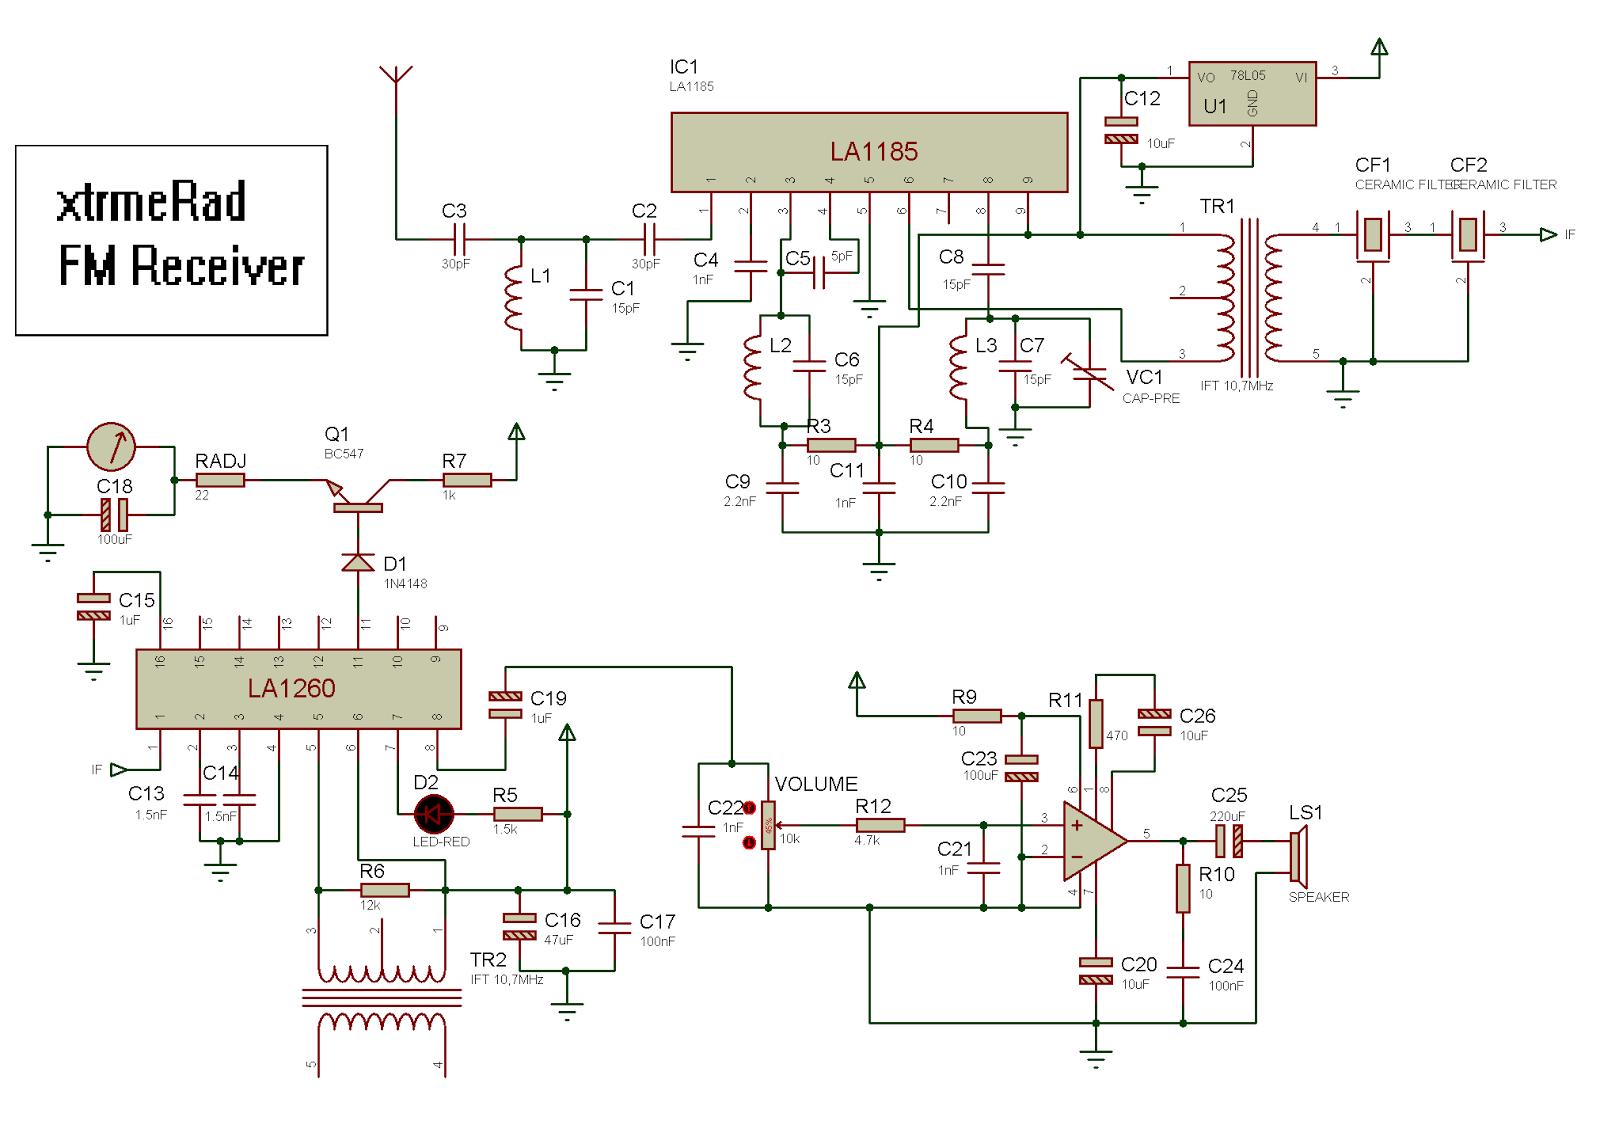 La1260 Fm If Mw Radio Receiver Schematic Circuit Diagram Wiring Dengan Tuner Pto Blok Xtrmerad